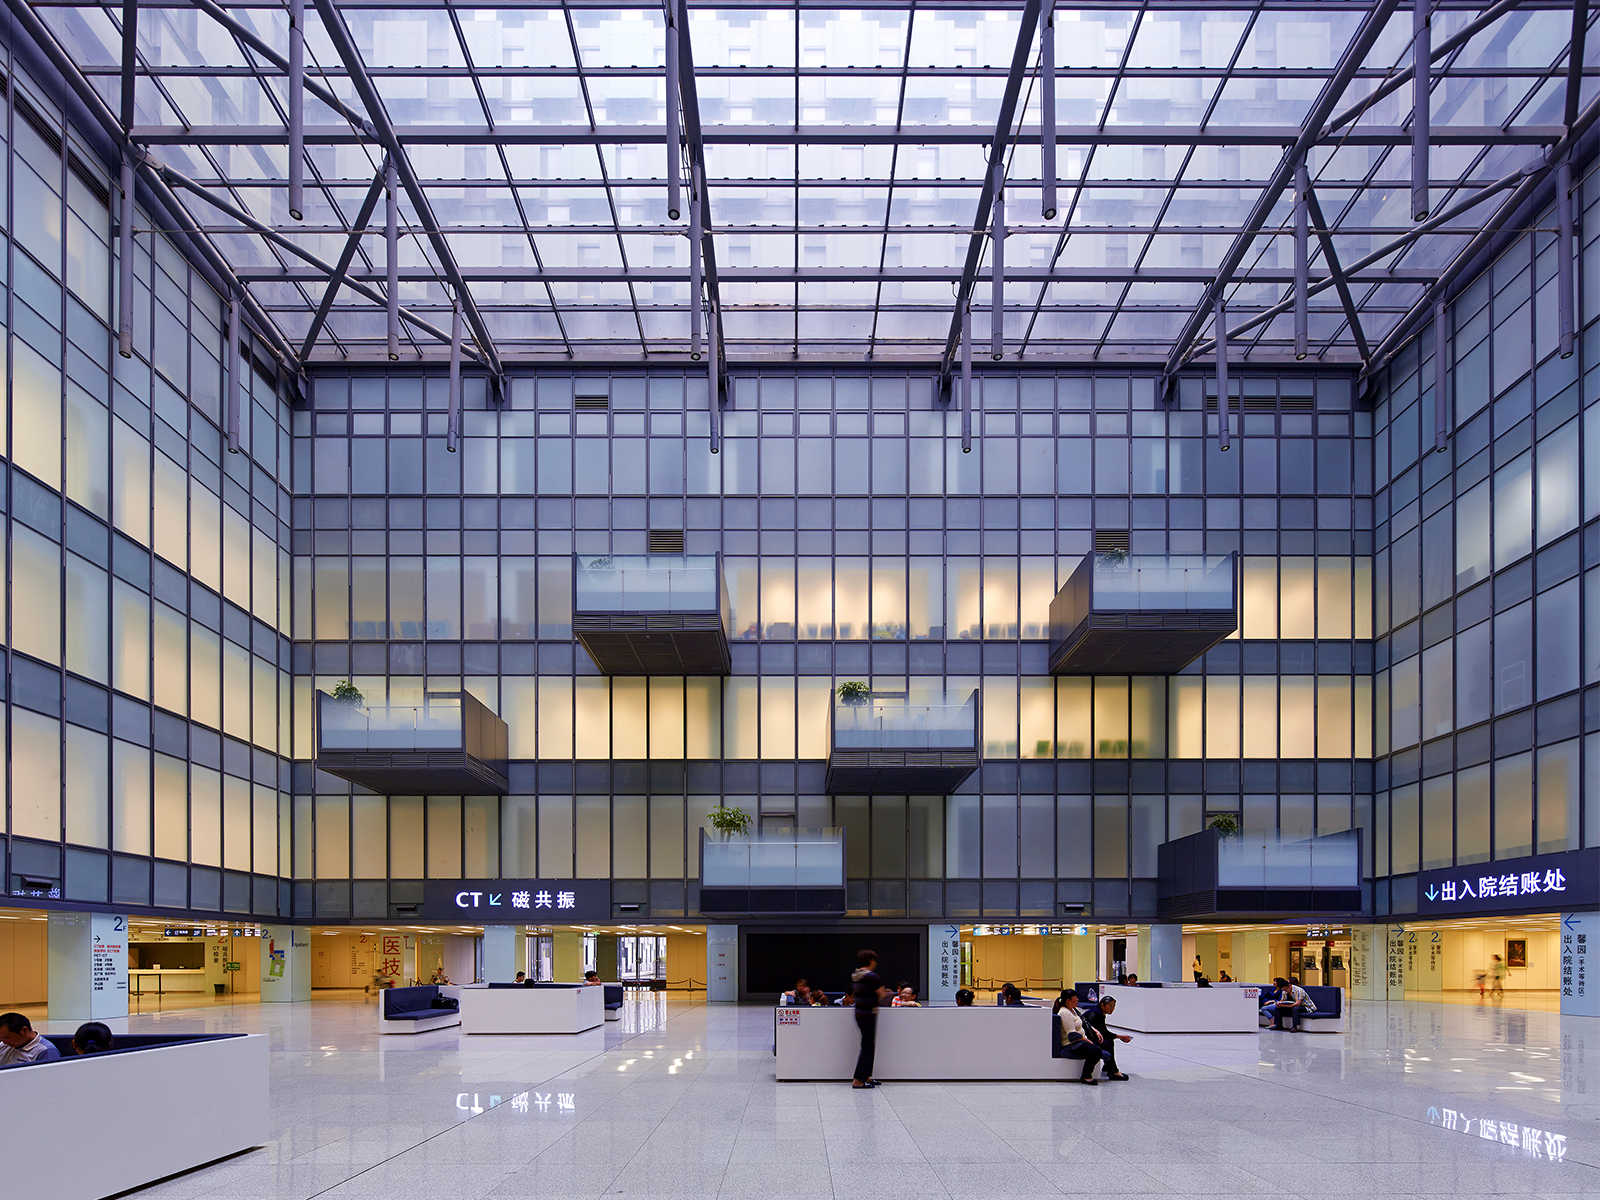 Nanjing-Drum-Tower-Hospital_Right_061.jpg